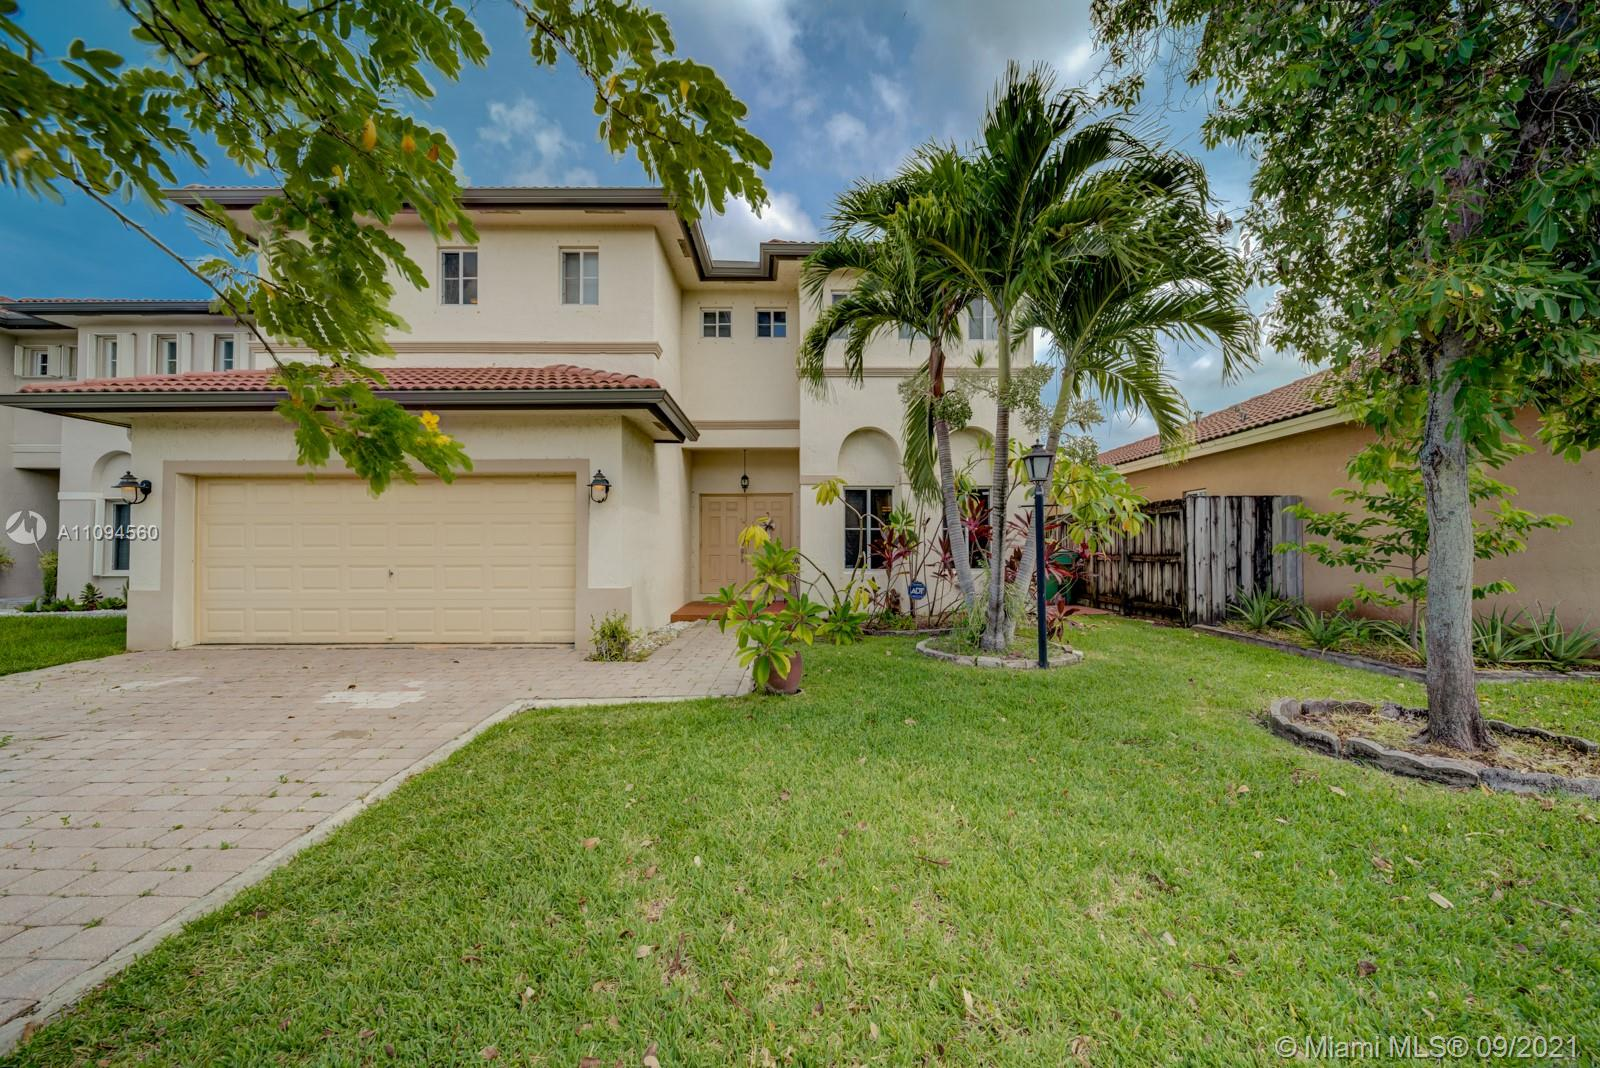 Four Lakes - 13733 SW 124th Avenue Rd, Miami, FL 33186